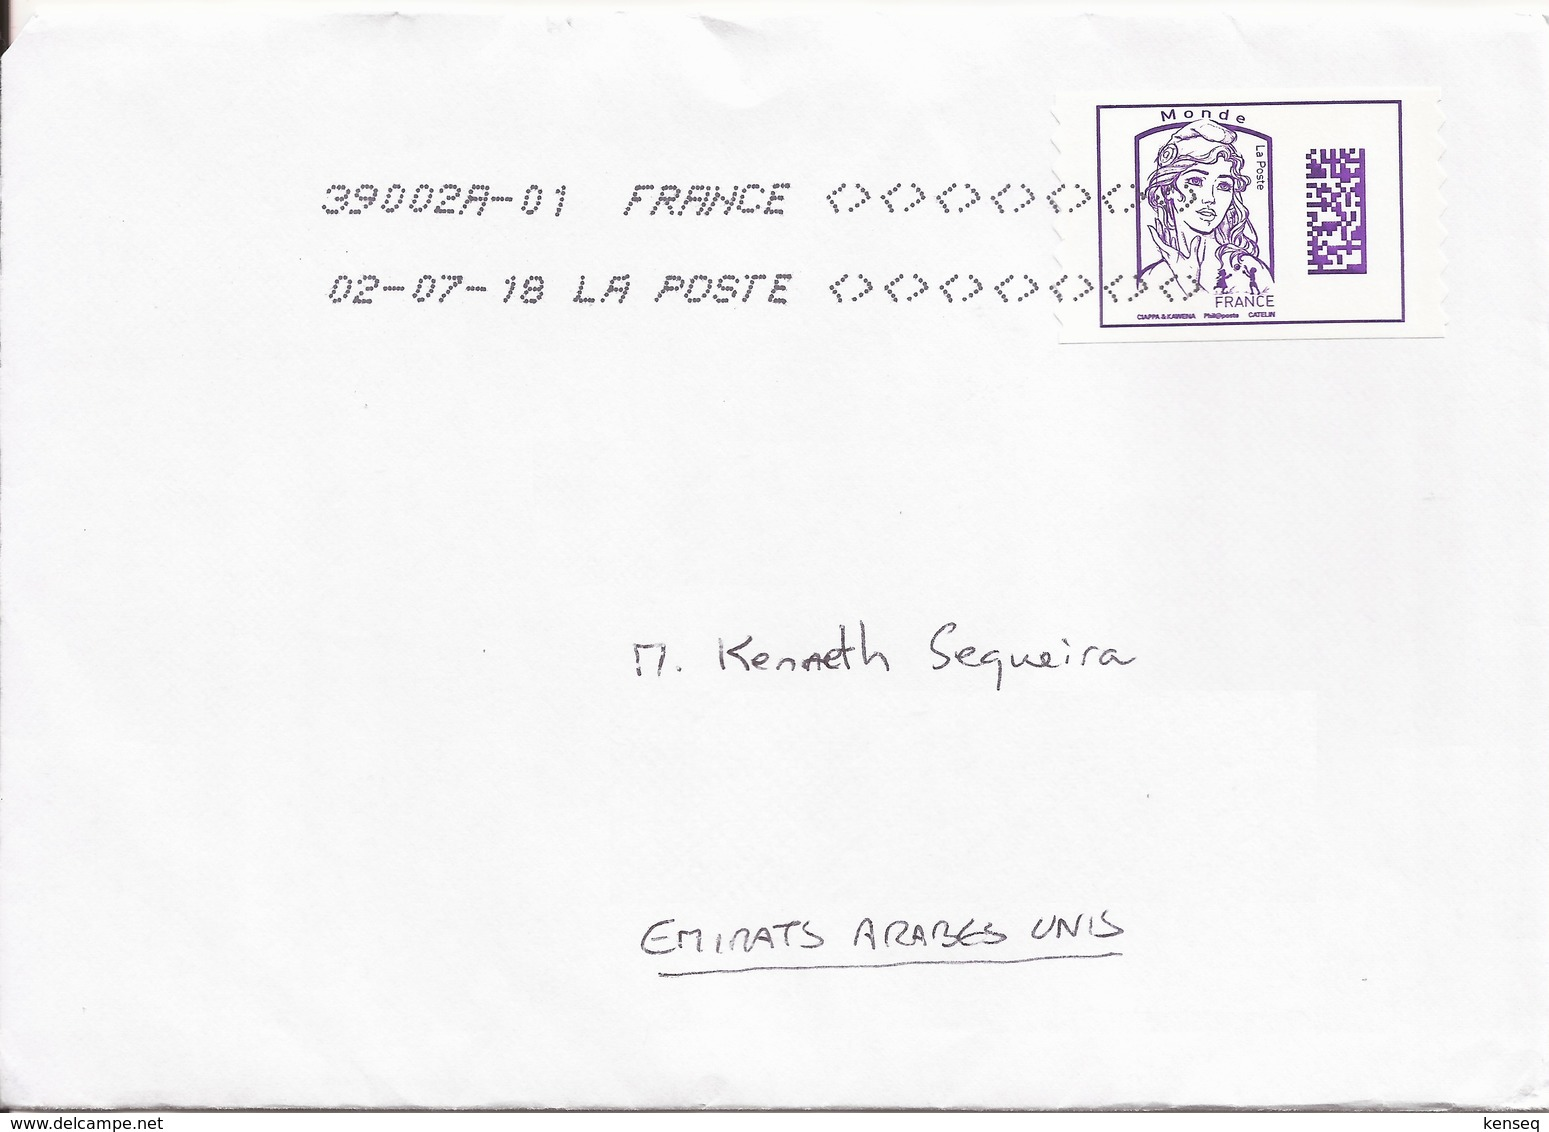 France 2018 - Used Cover - Definitive - Frankrijk